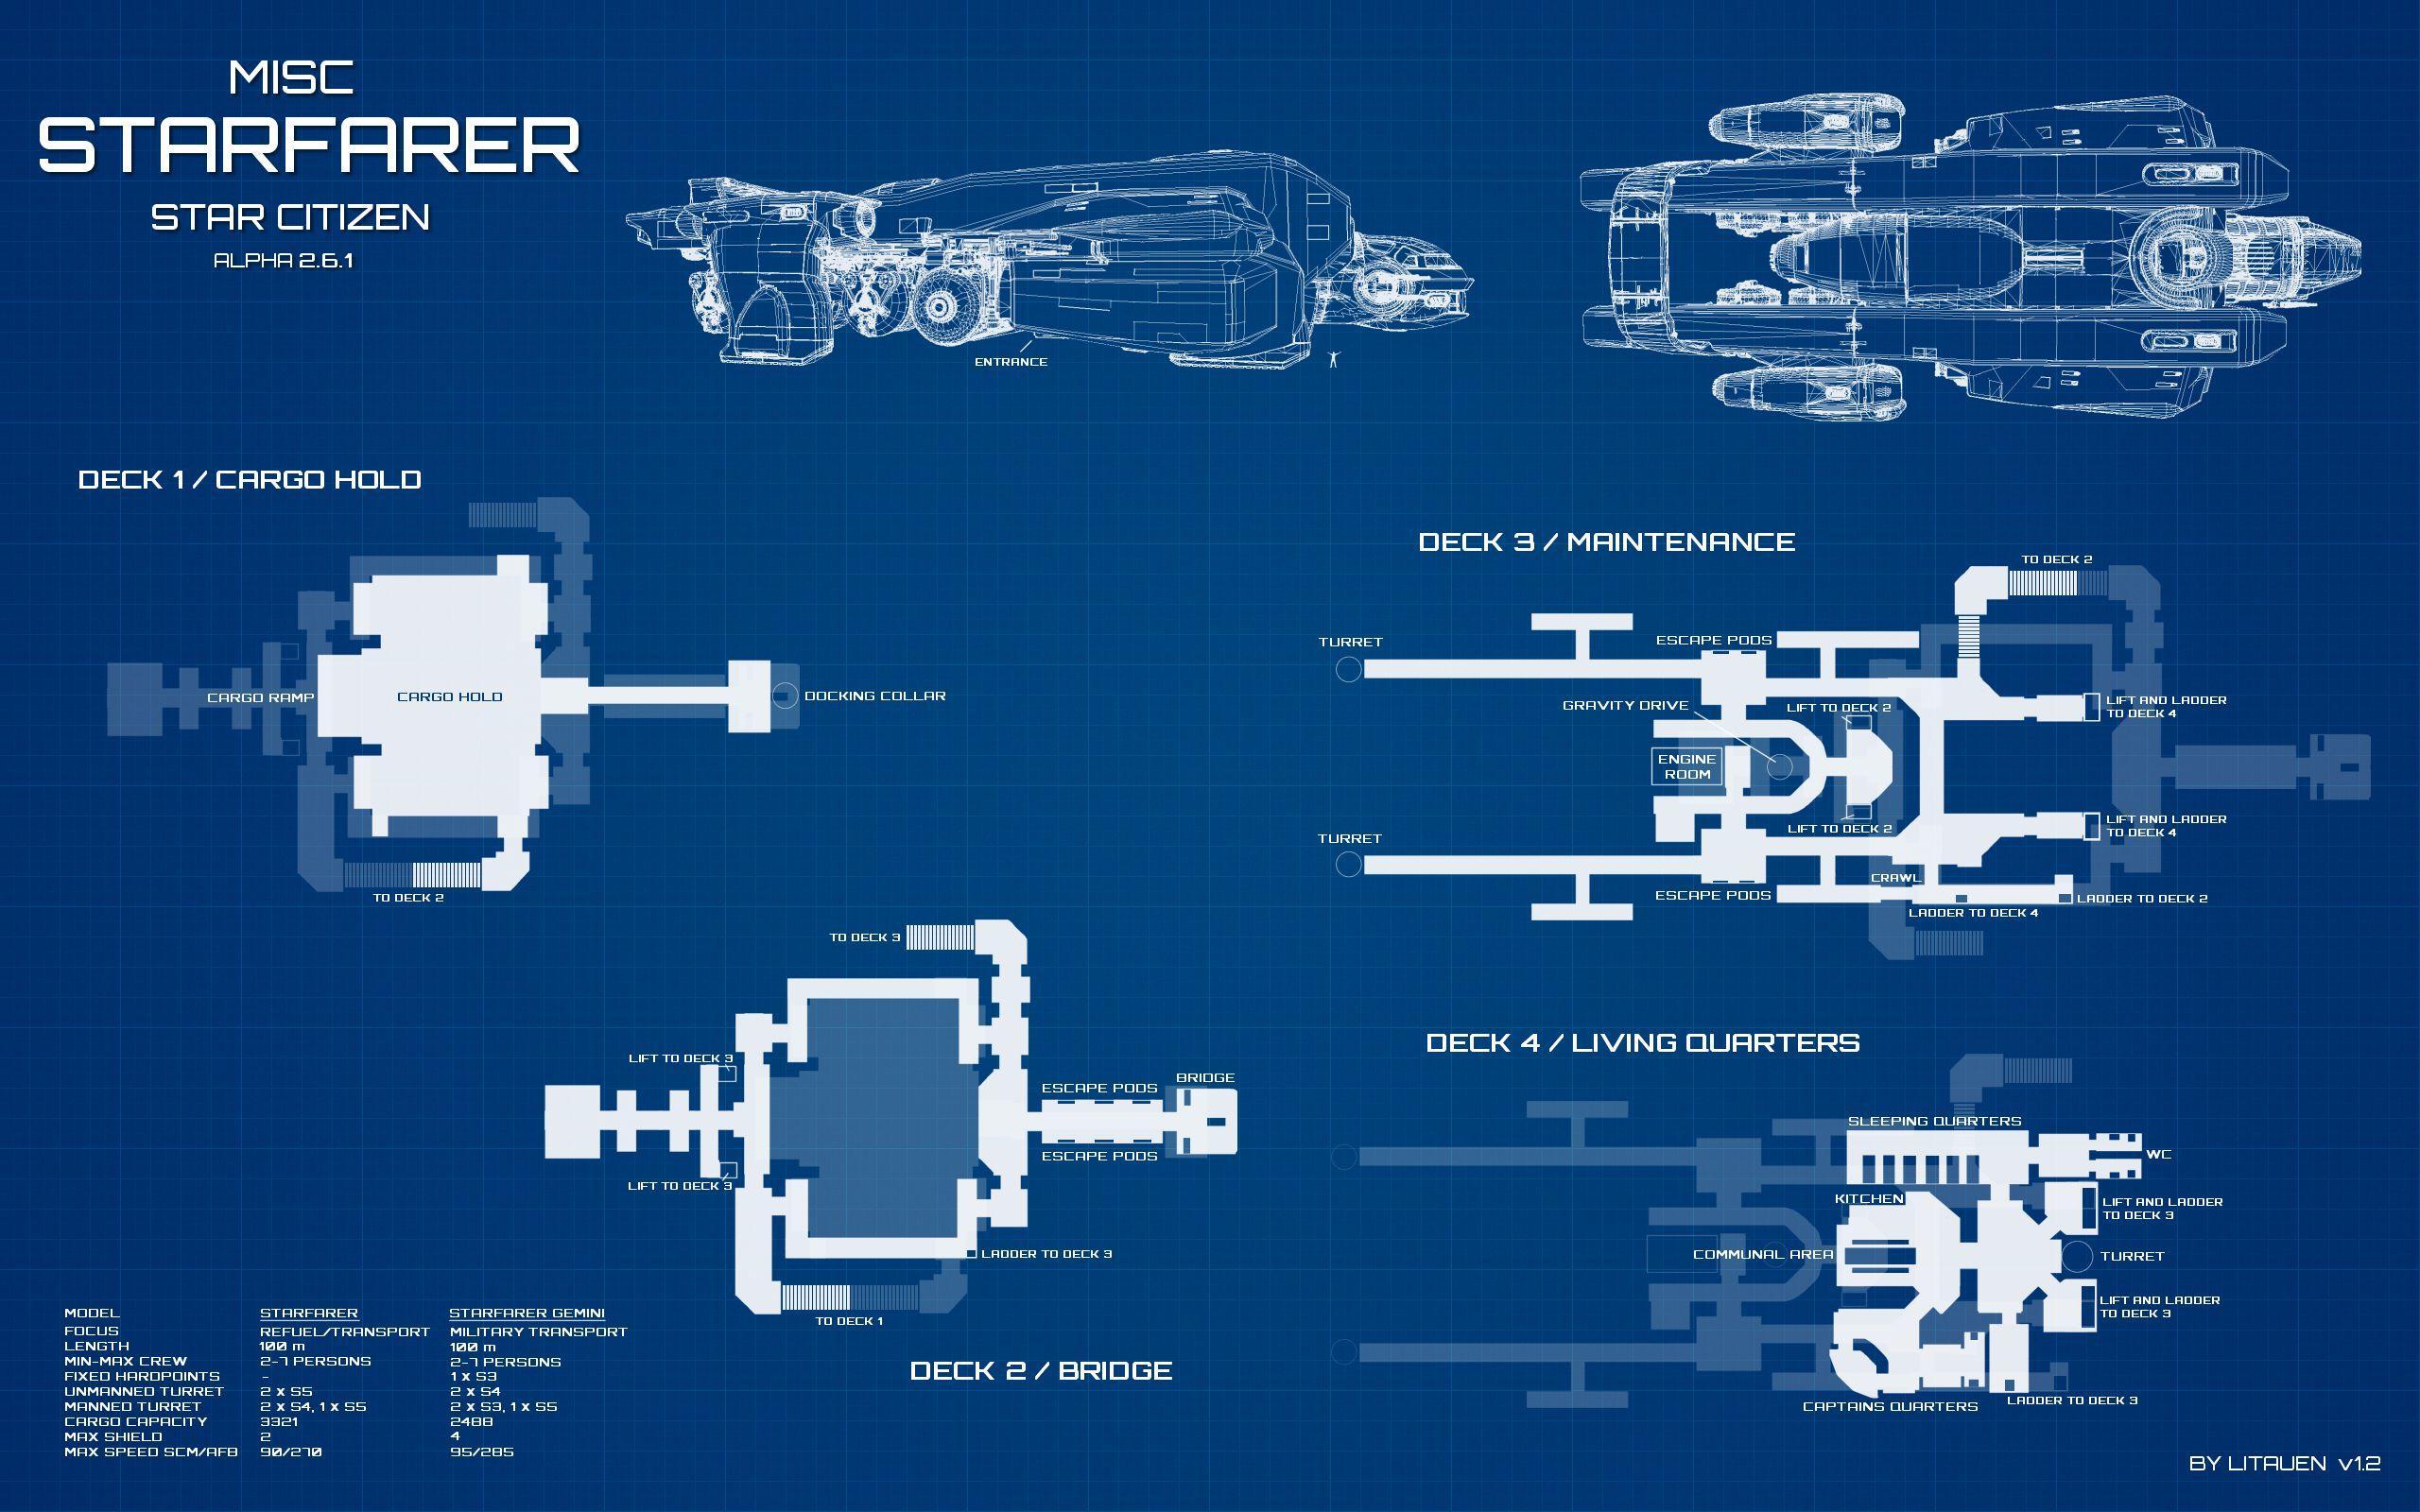 MISC Starfarer - plan